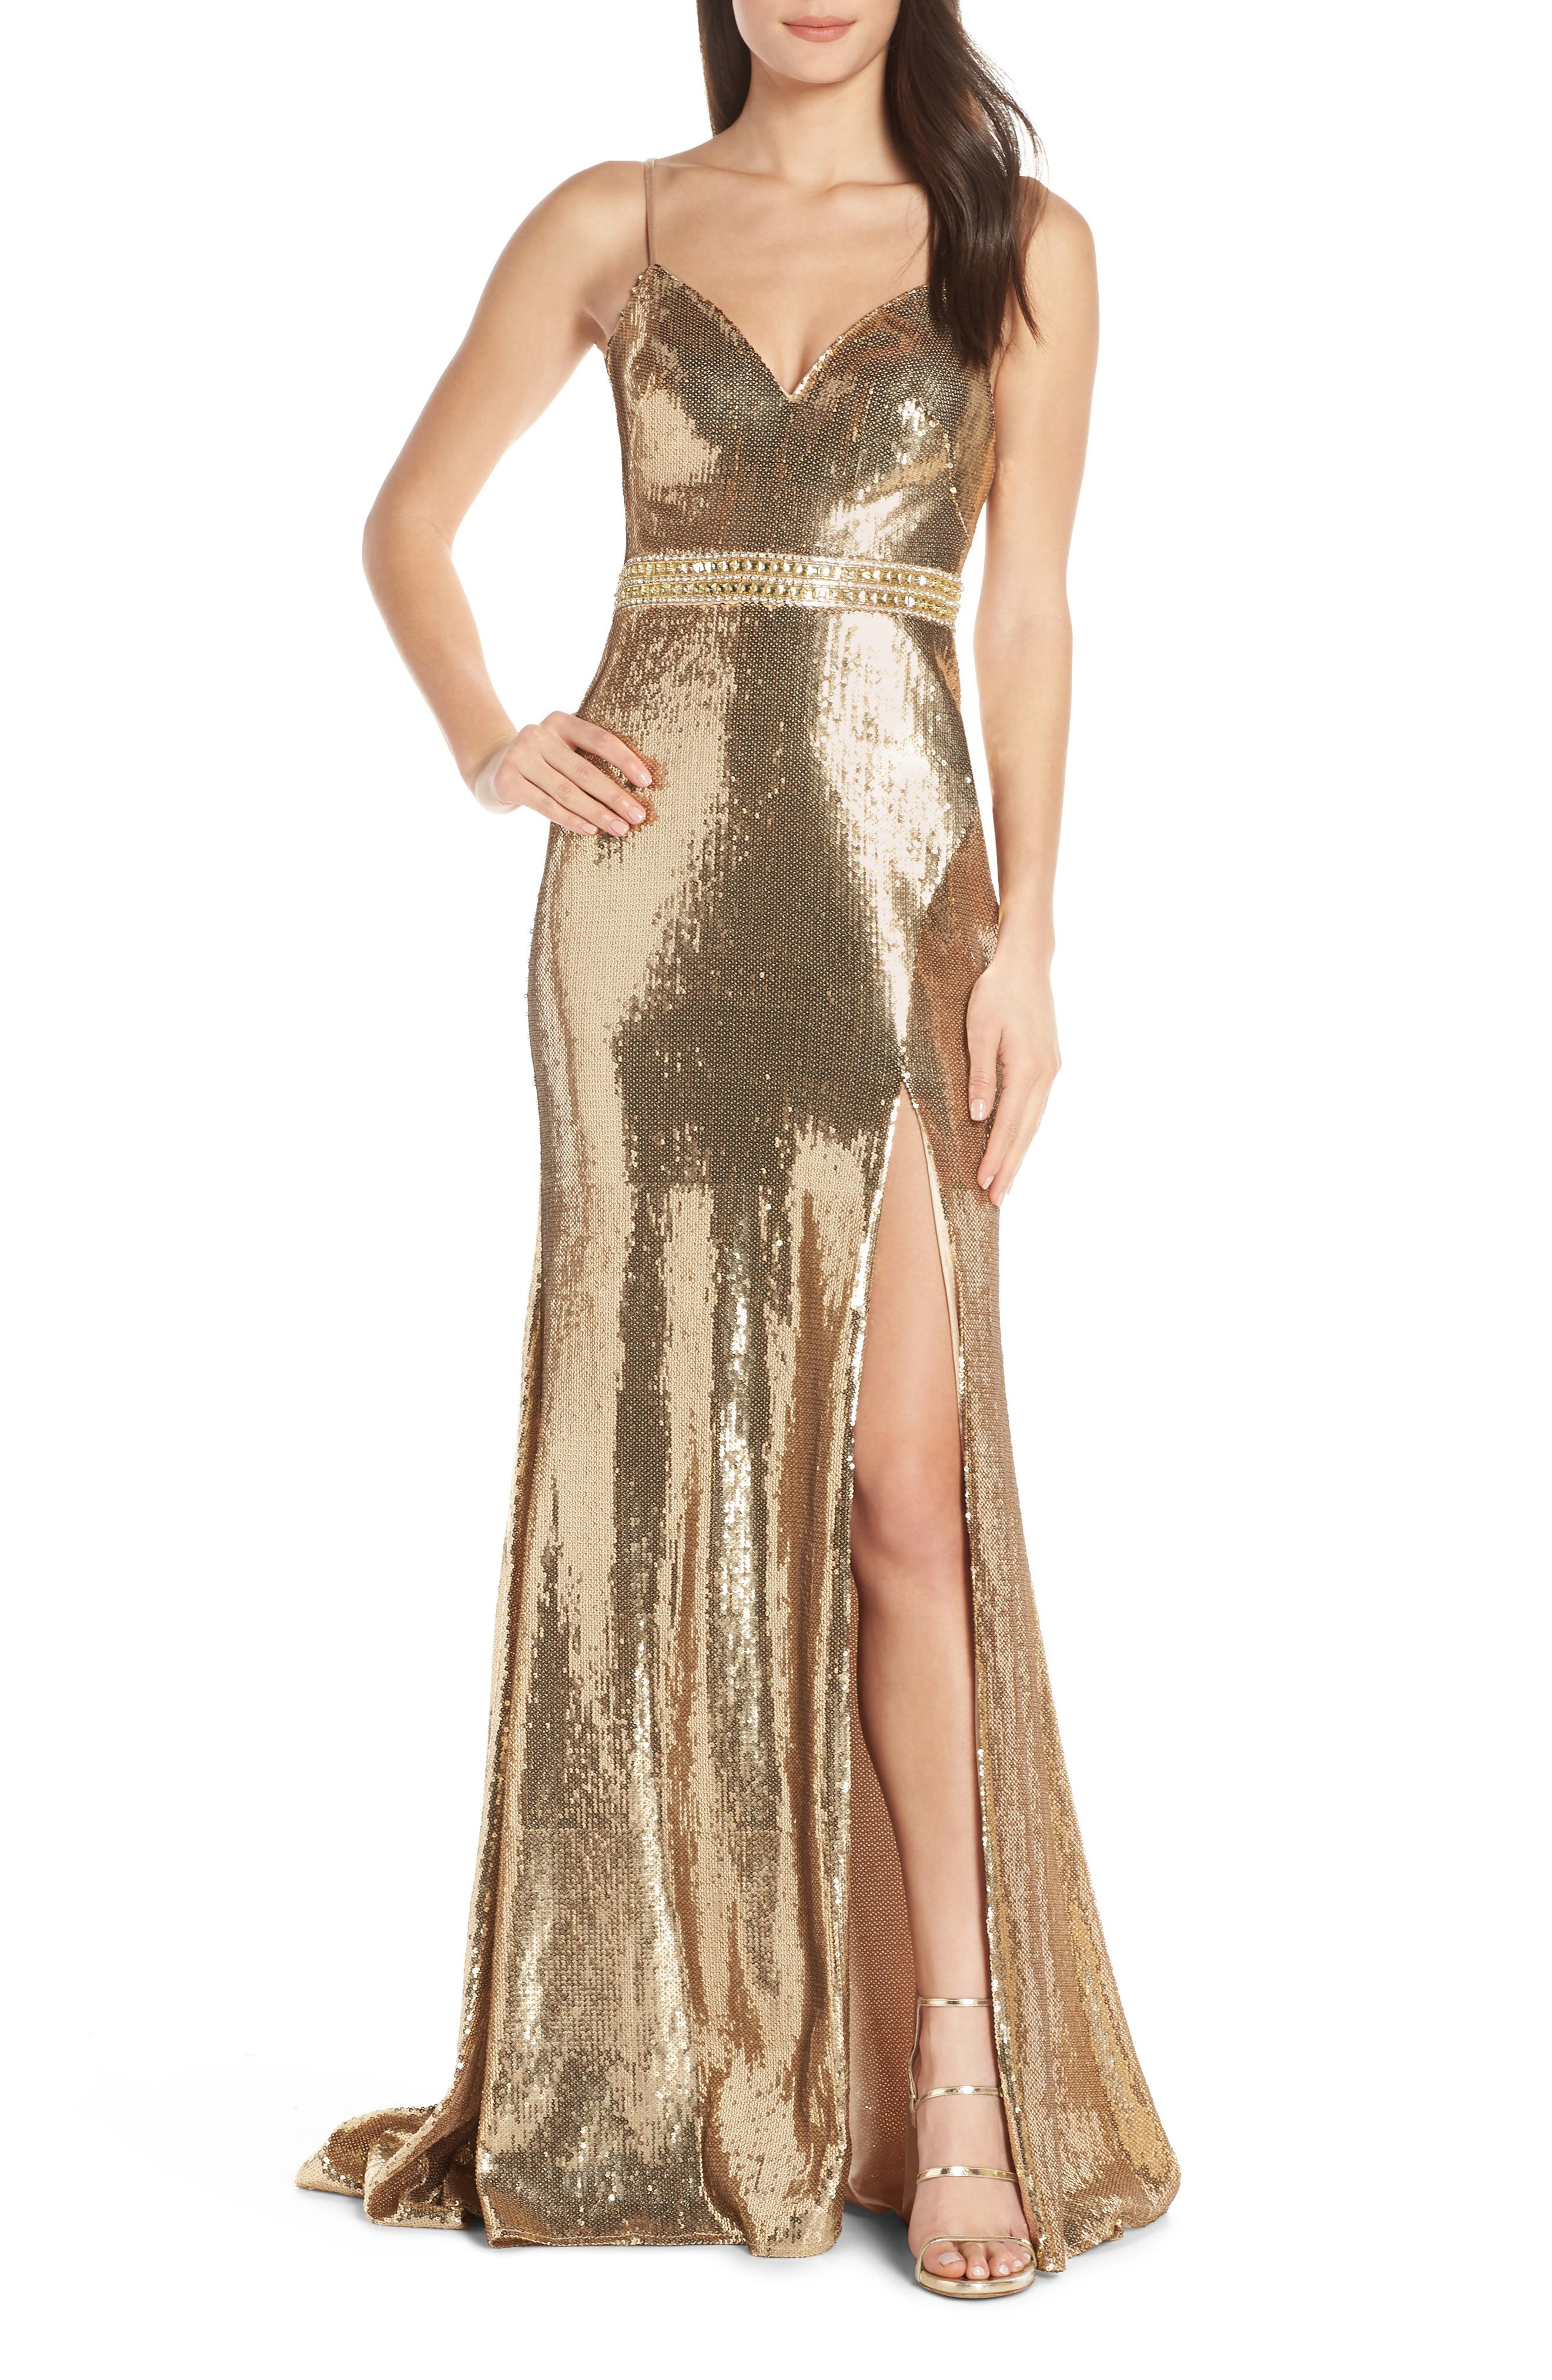 1960s – 70s Cocktail, Party, Prom, Evening Dresses Womens MAC Duggal Embellished Bodice Metallic Evening Dress $398.00 AT vintagedancer.com